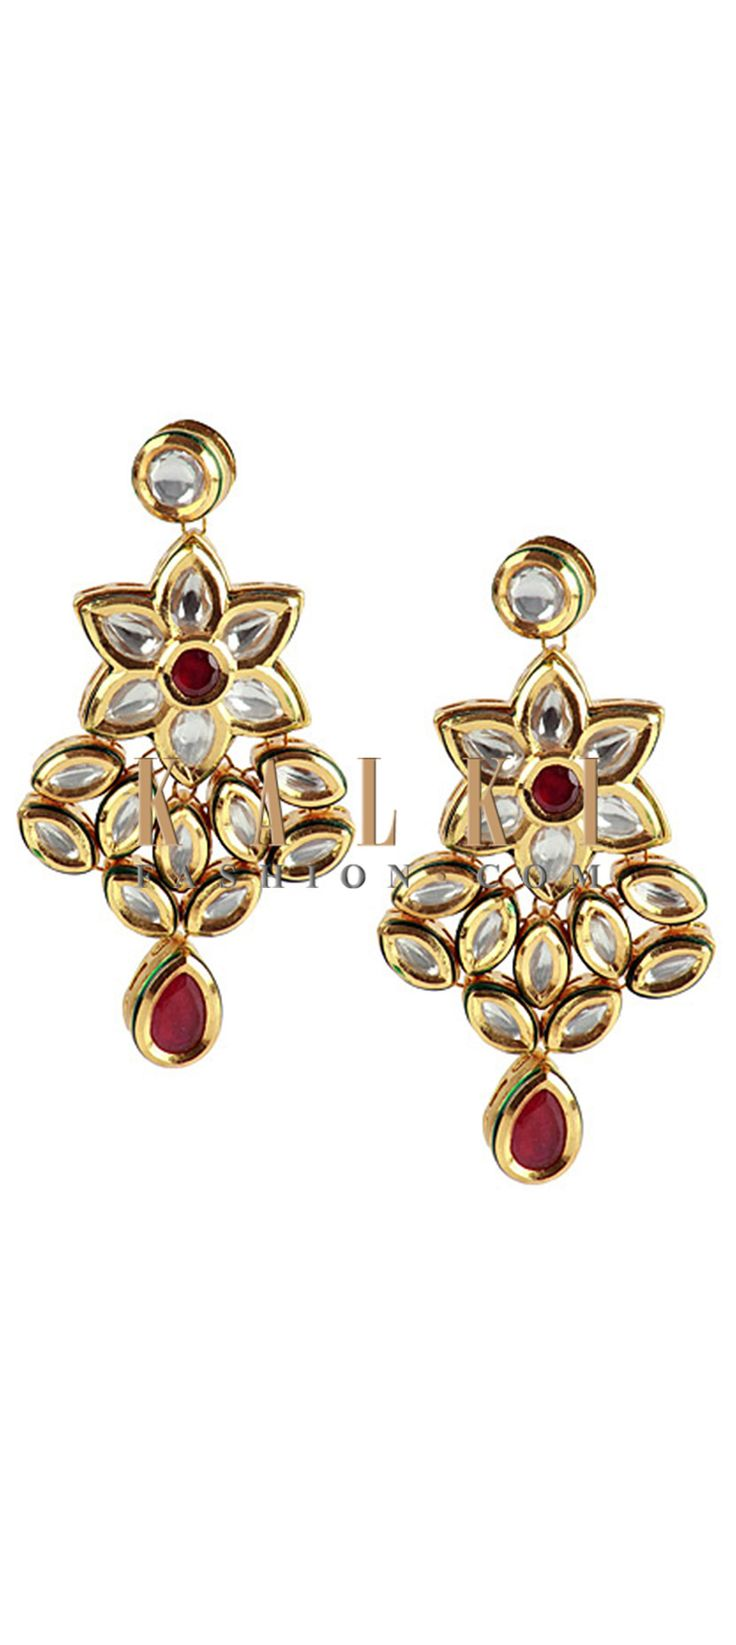 Buy Online from the link below http://www.kalkifashion.com/floral-kundan-studded-danglers.html